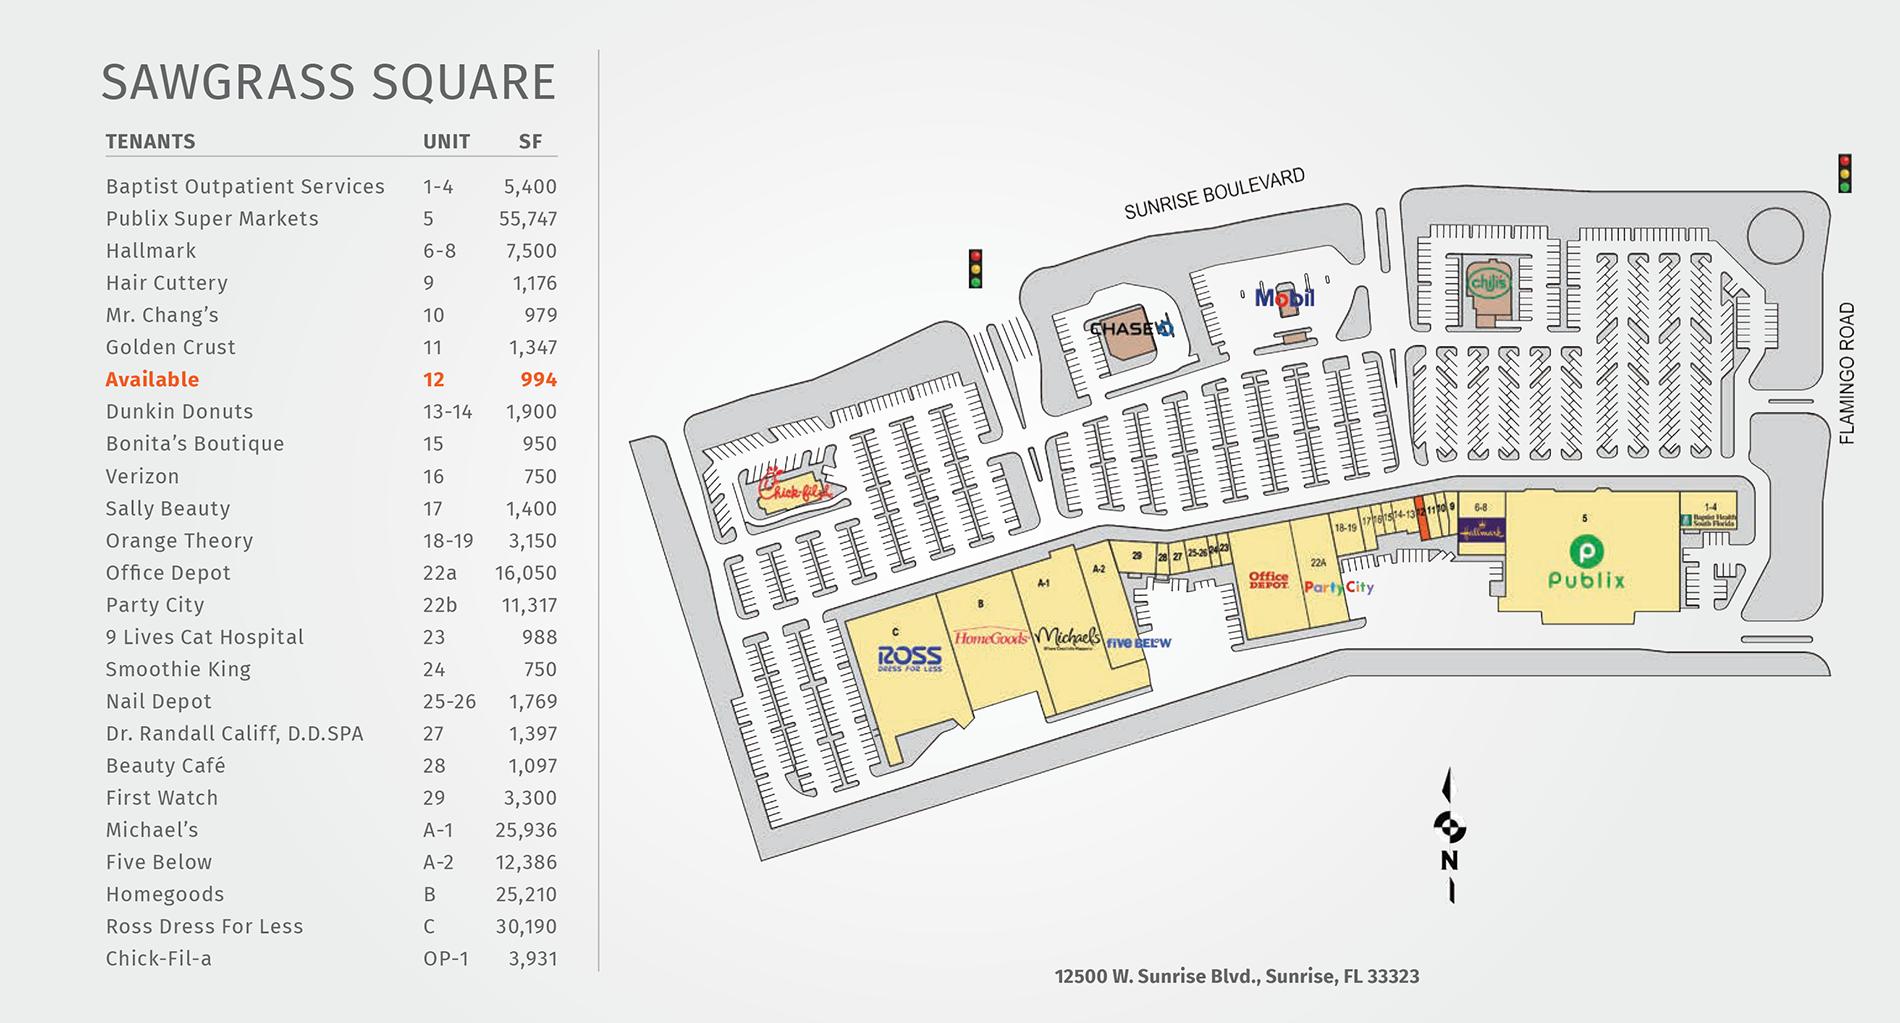 Sawgrass Square site map